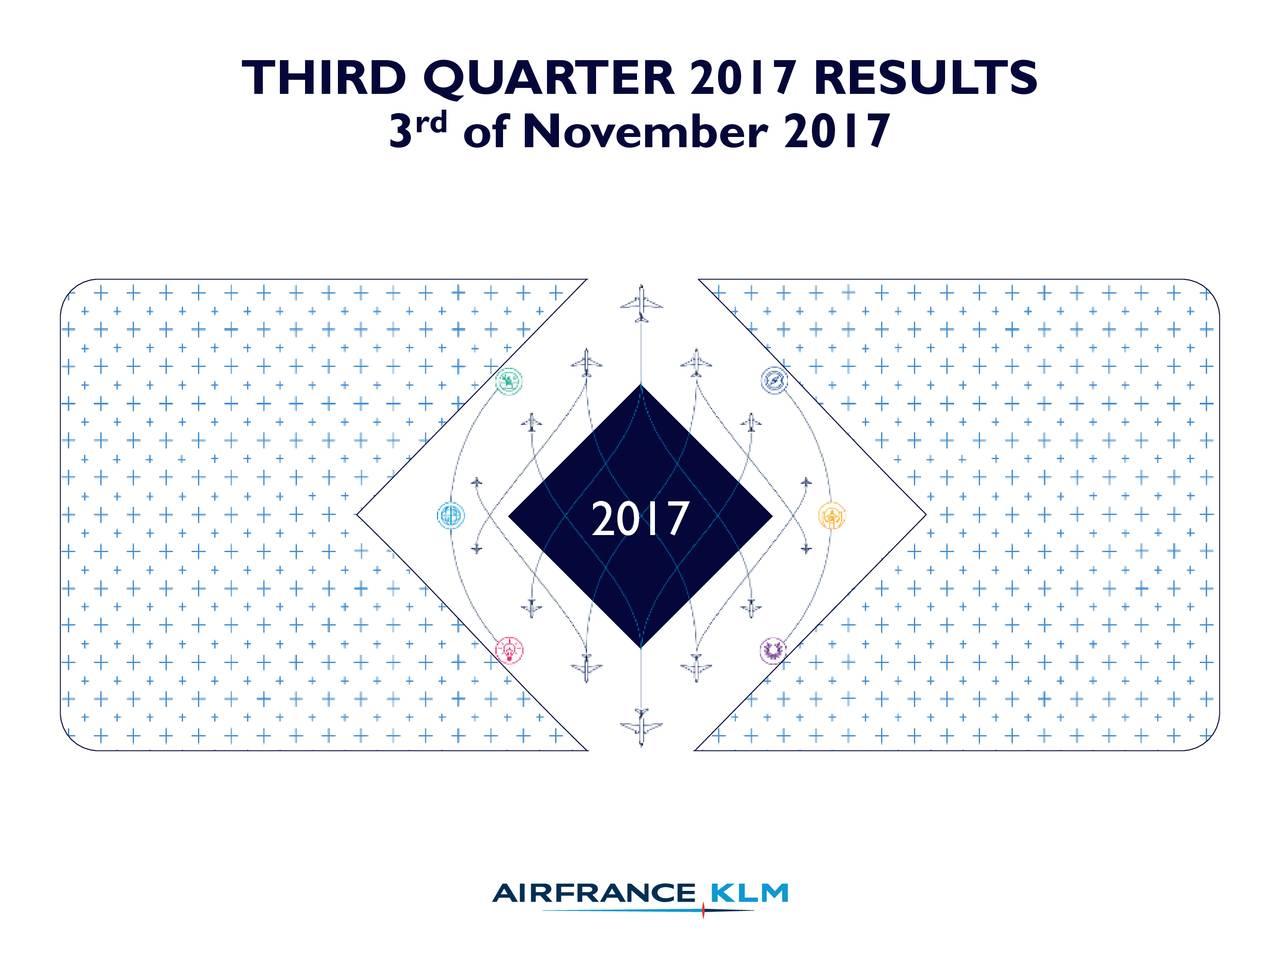 3 of November 2017 2017